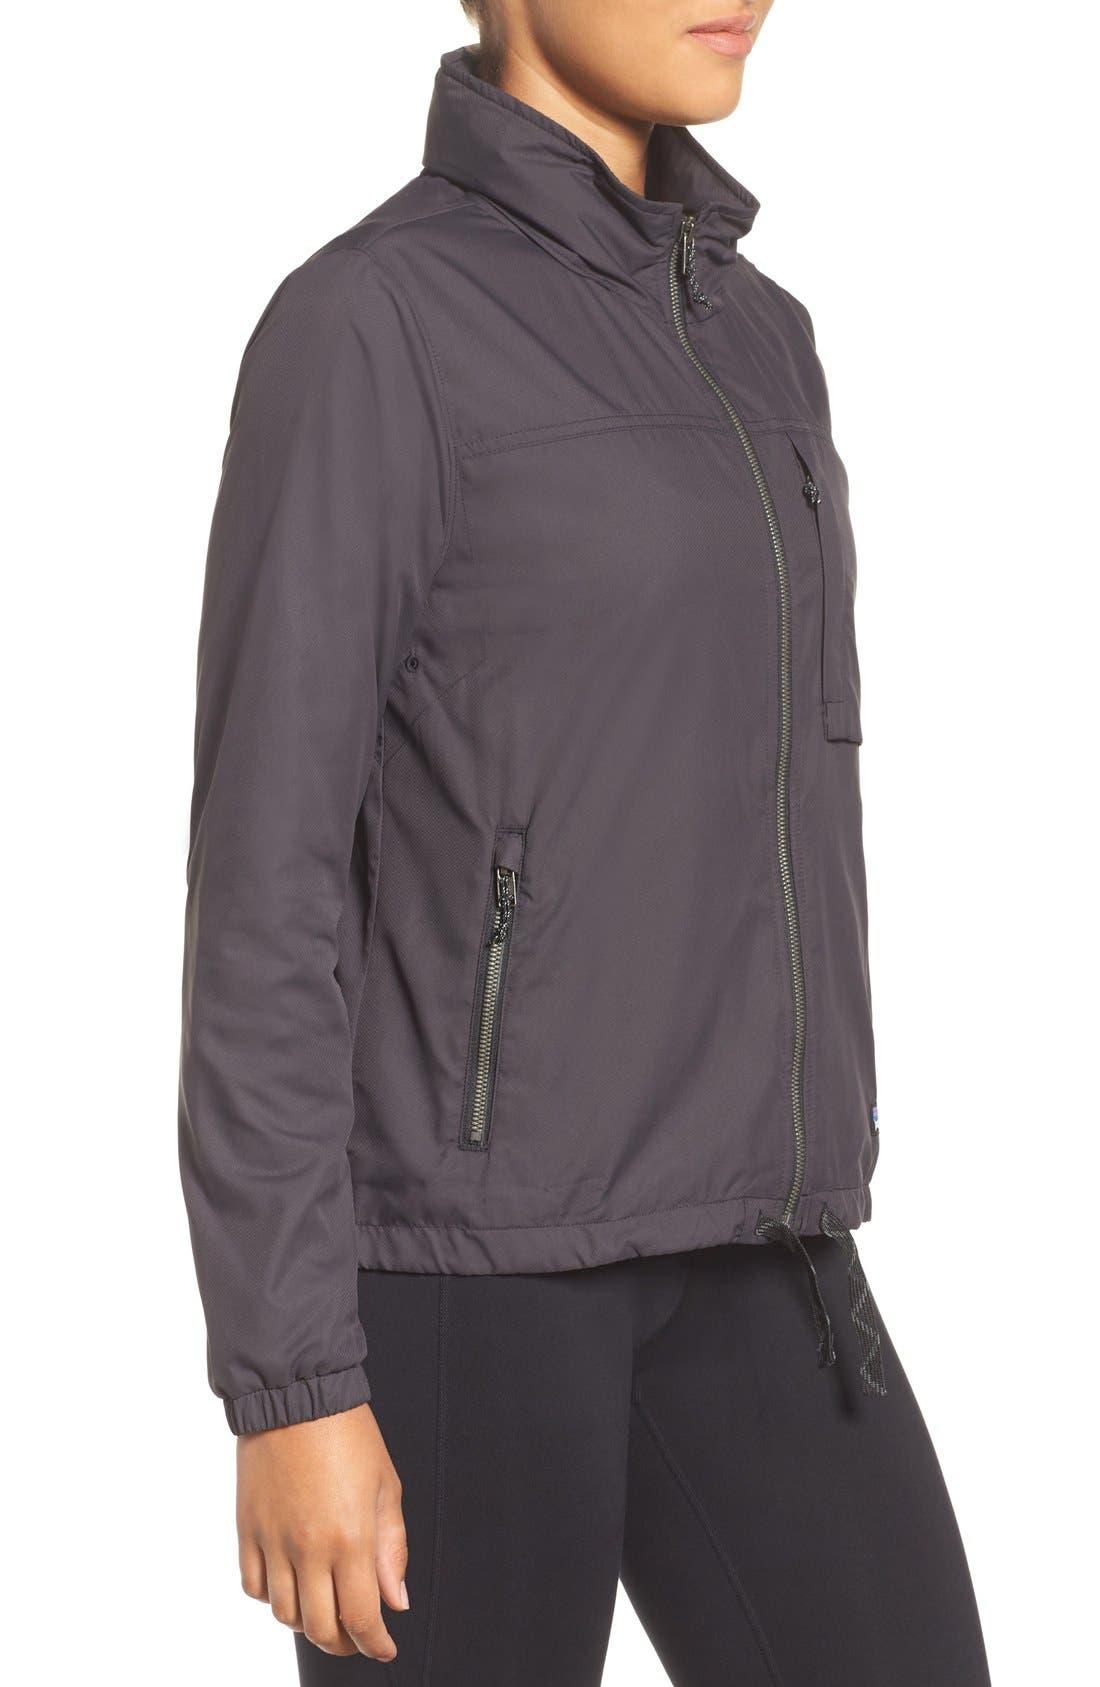 Mountain View Windbreaker Jacket,                             Alternate thumbnail 3, color,                             Ink Black